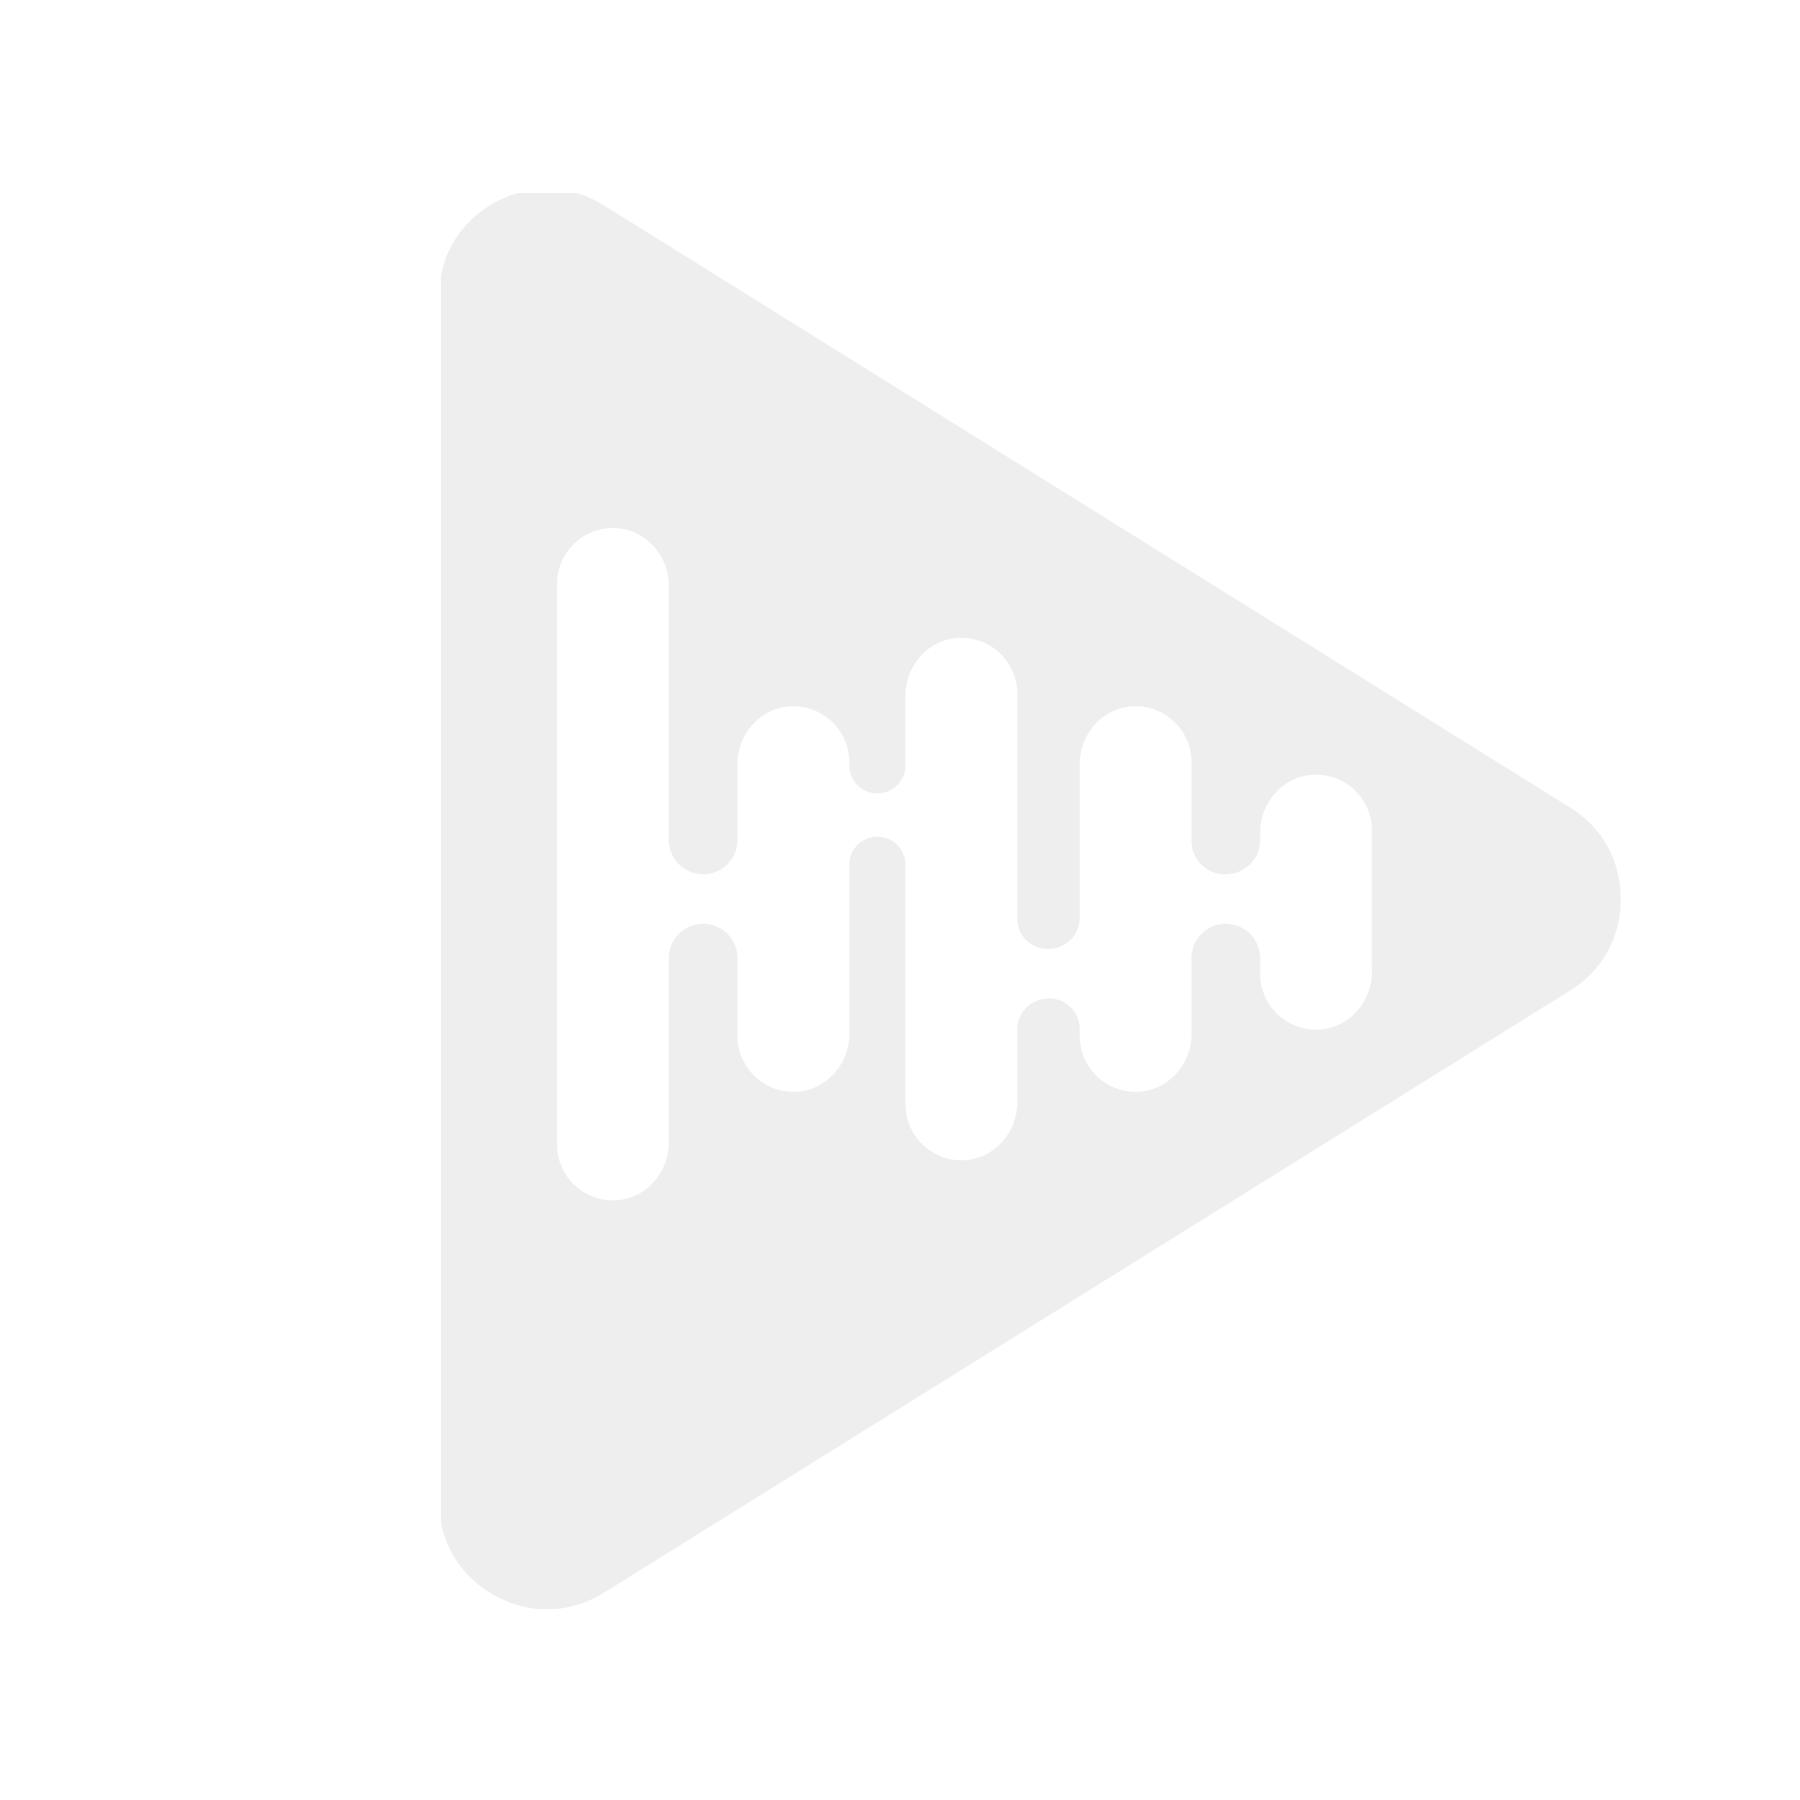 Phonocar VM277 - Biltilpasset ryggekamera